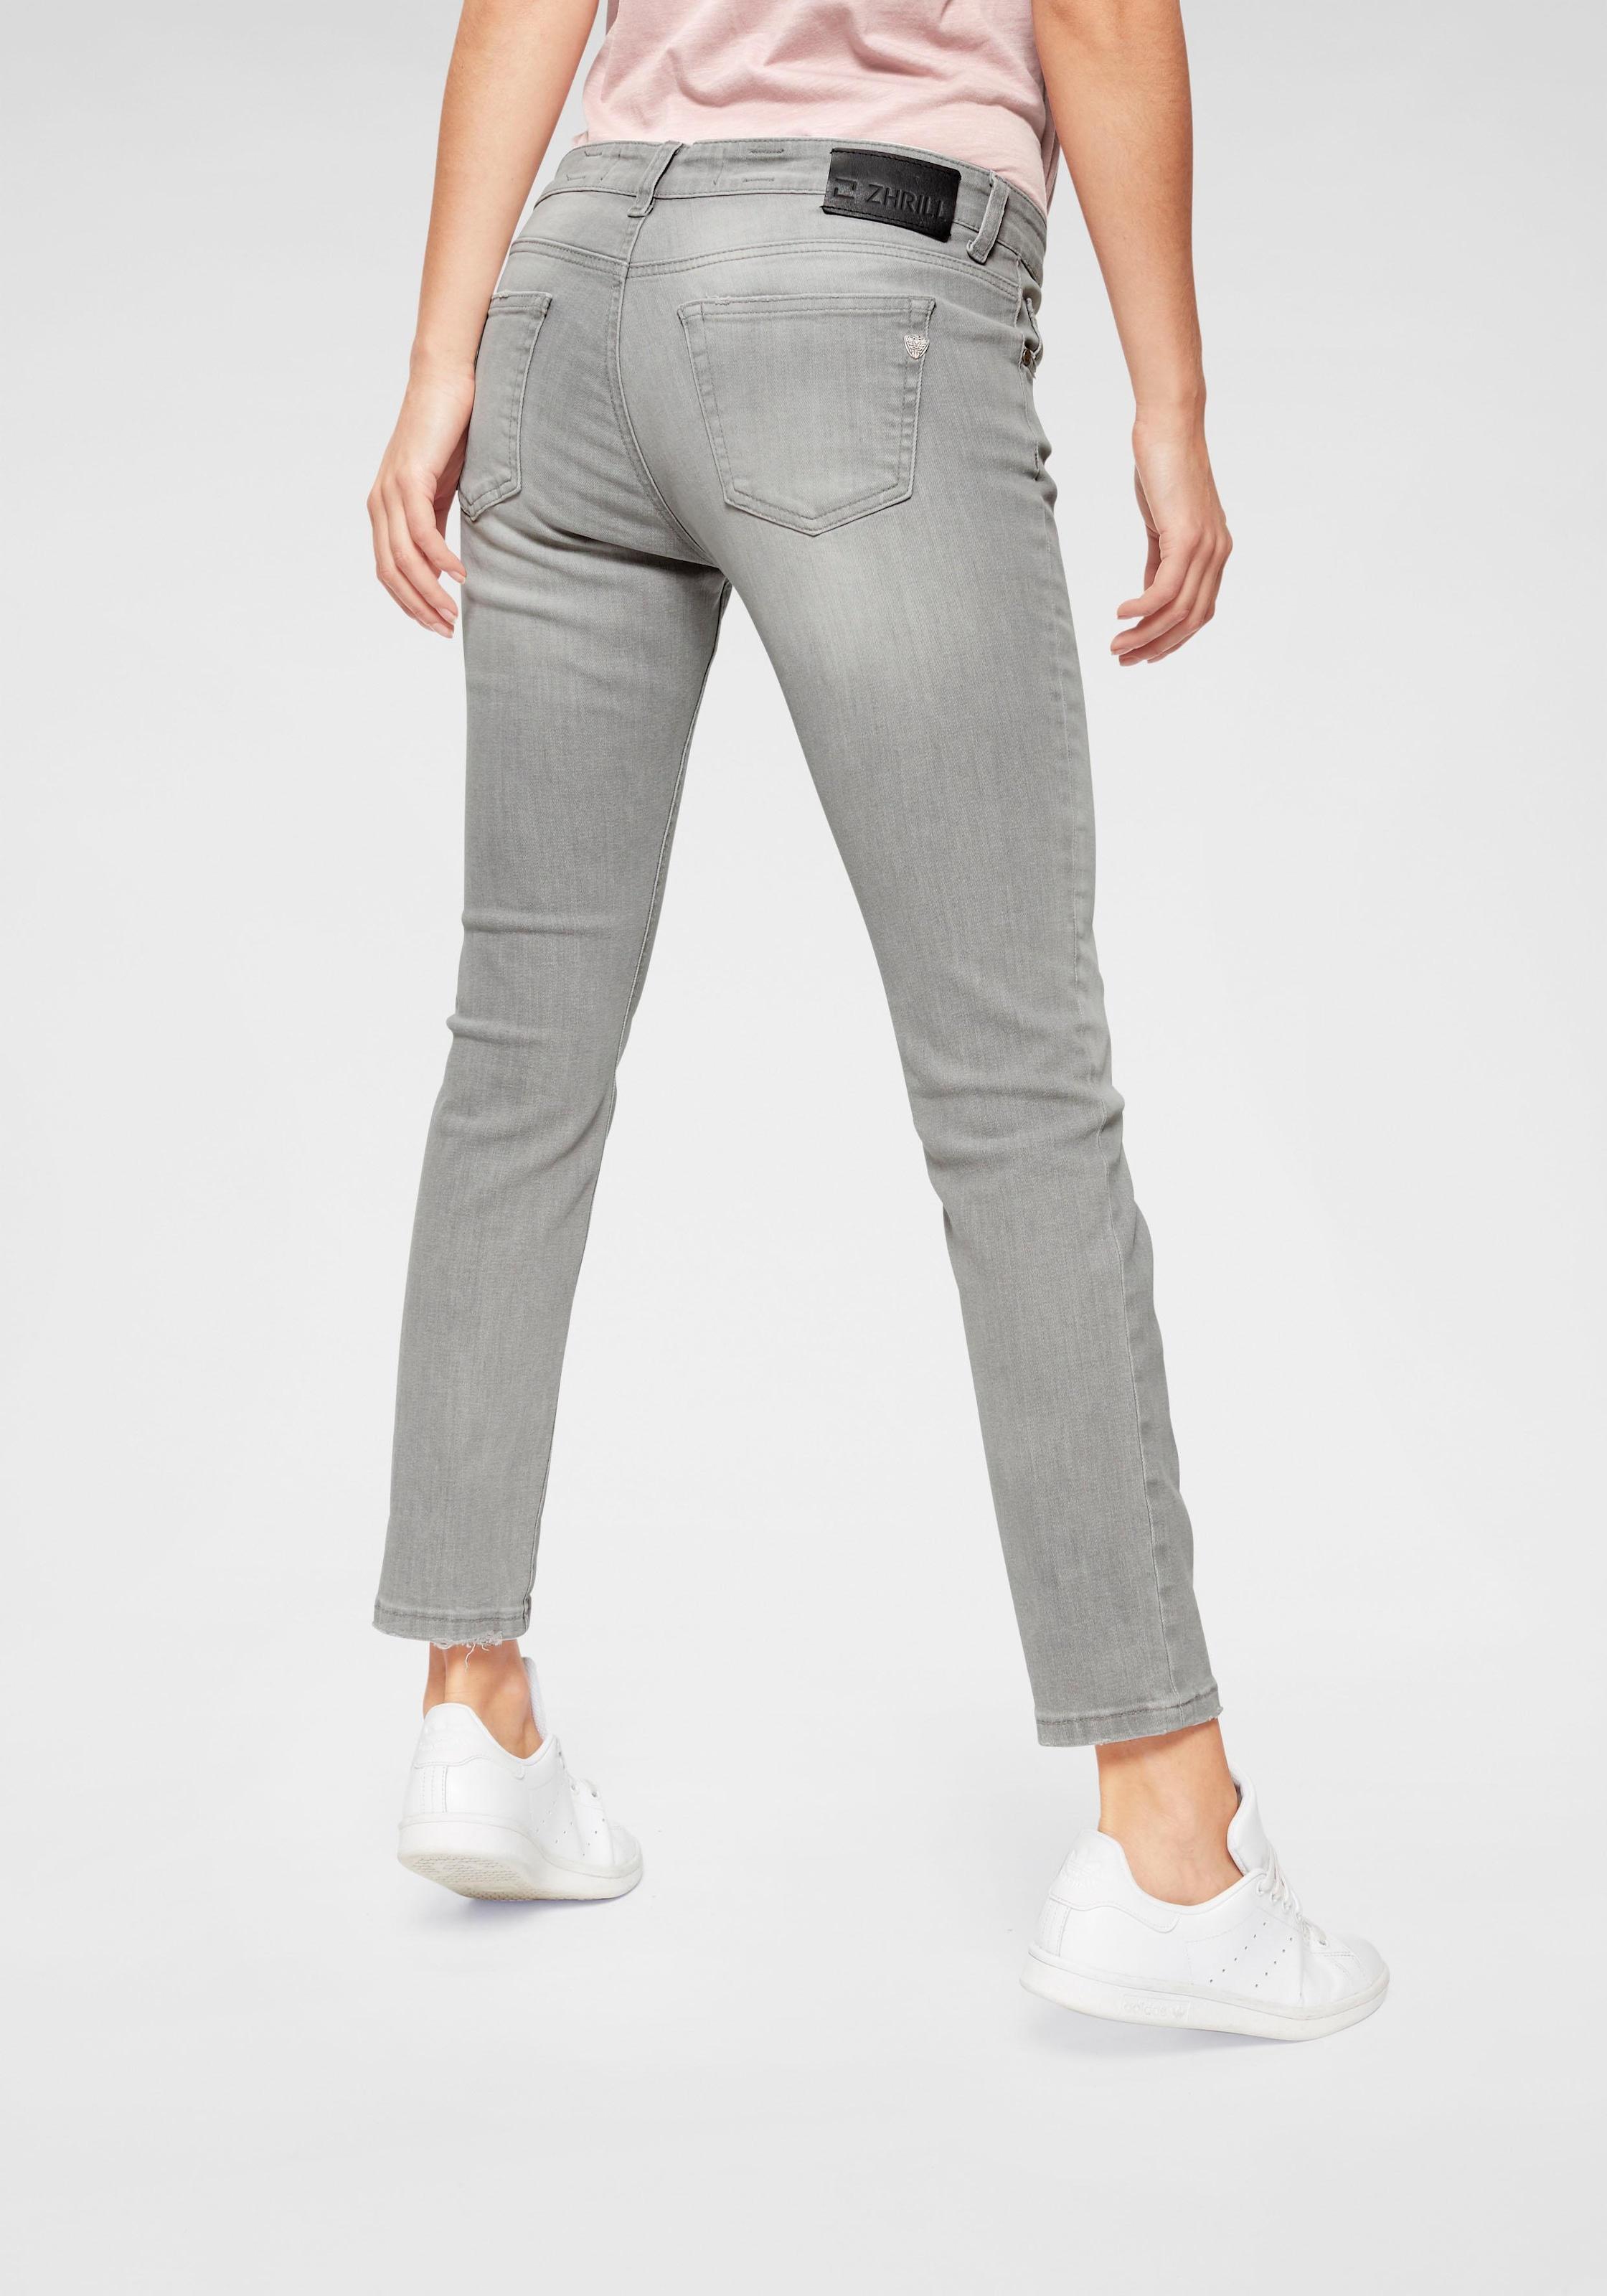 Zhrill Charly Denim Damen Jeans Grey